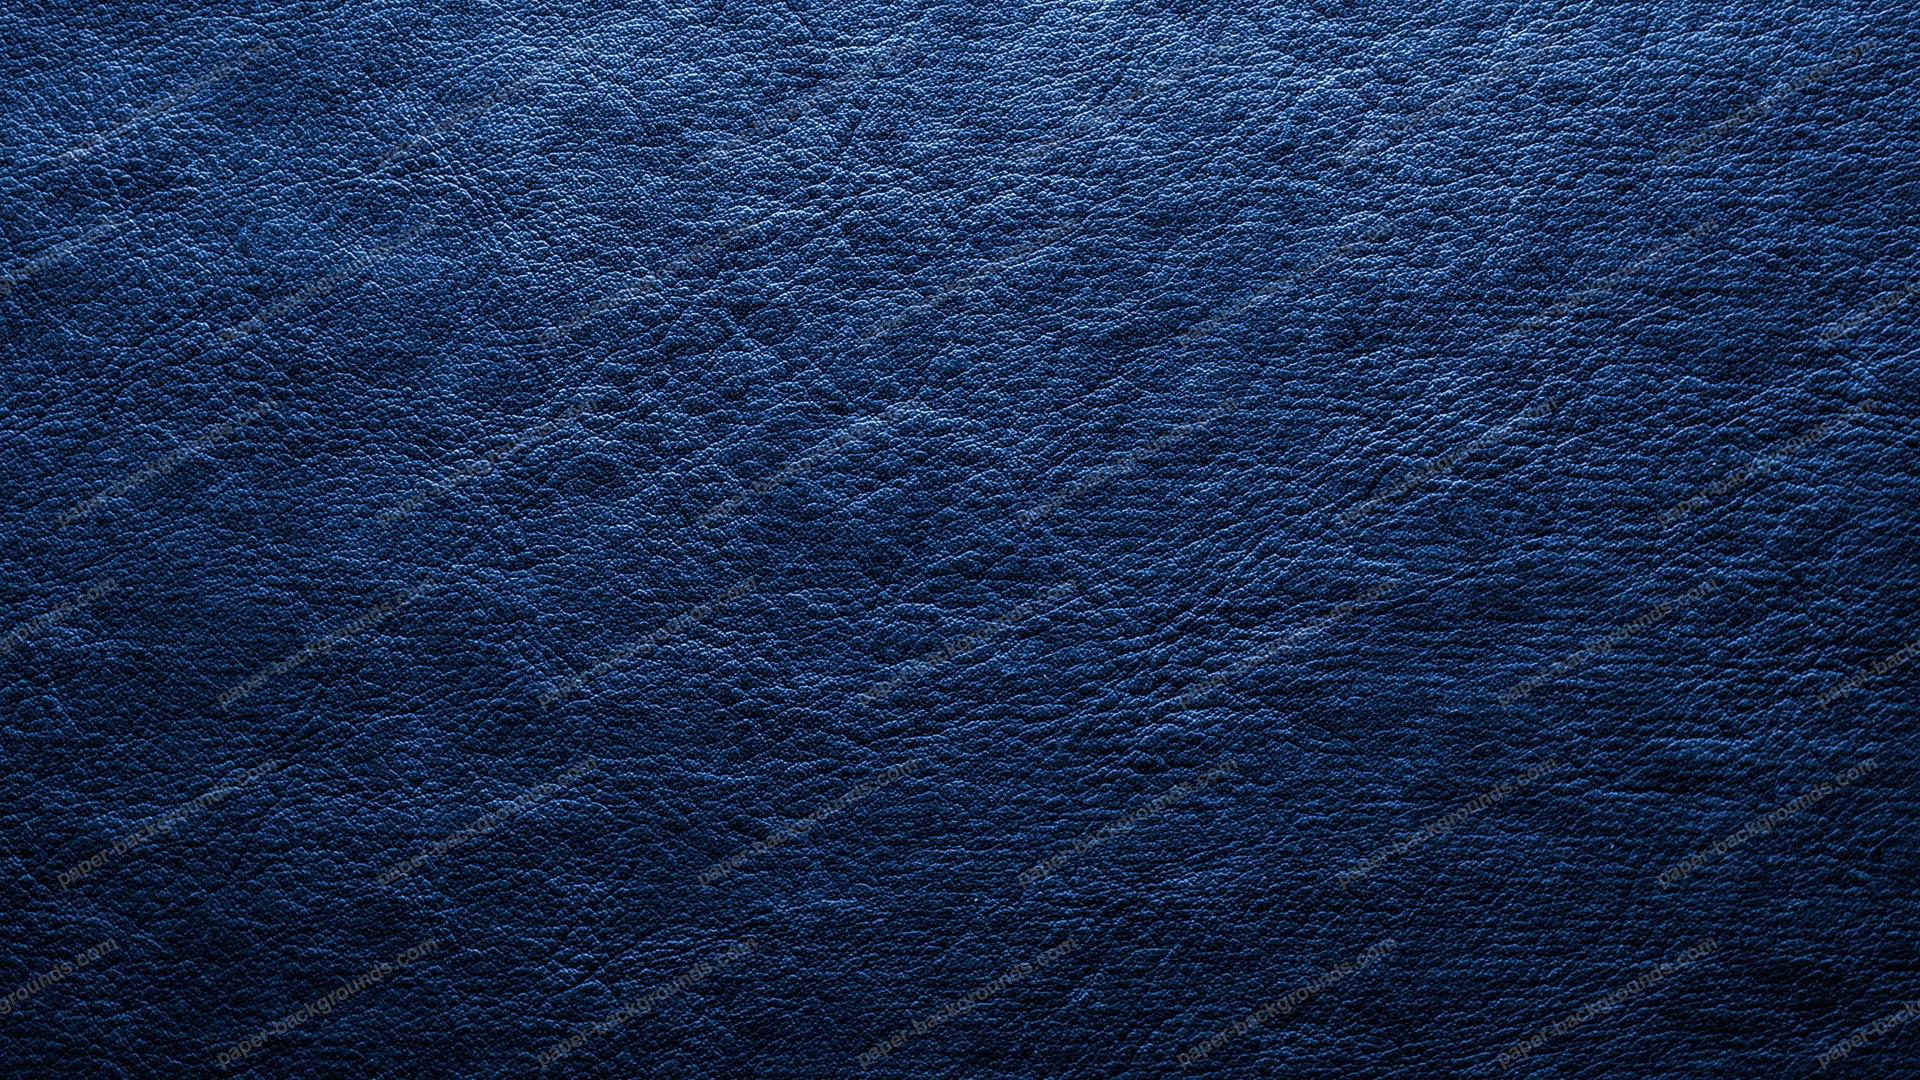 Dark Blue HD Wallpapers - WallpaperSafari Dark Blue Background Hd